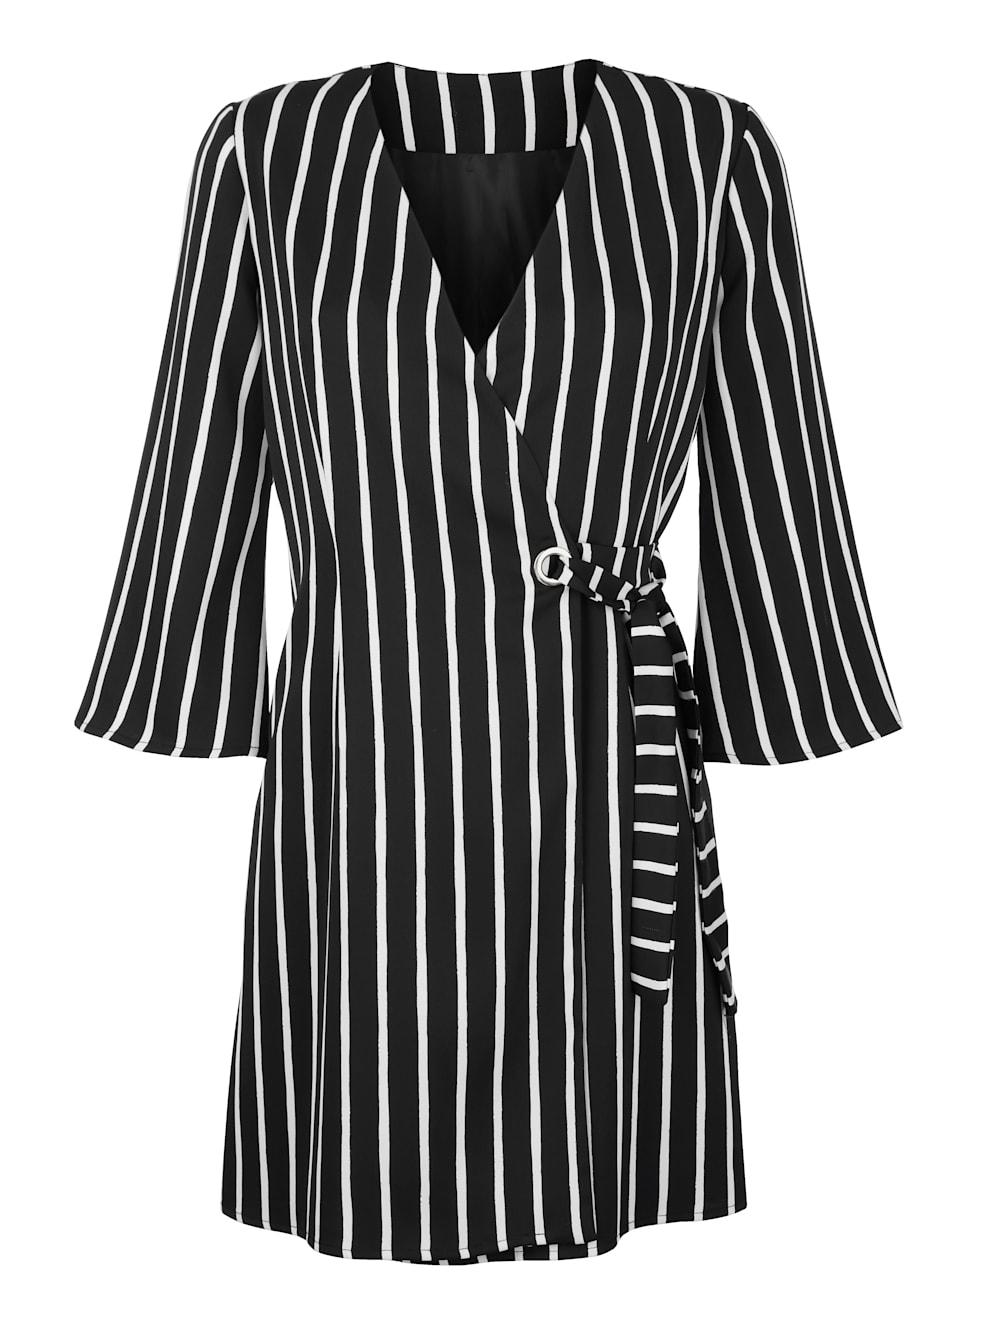 alba moda kleid im streifendessin allover | alba moda